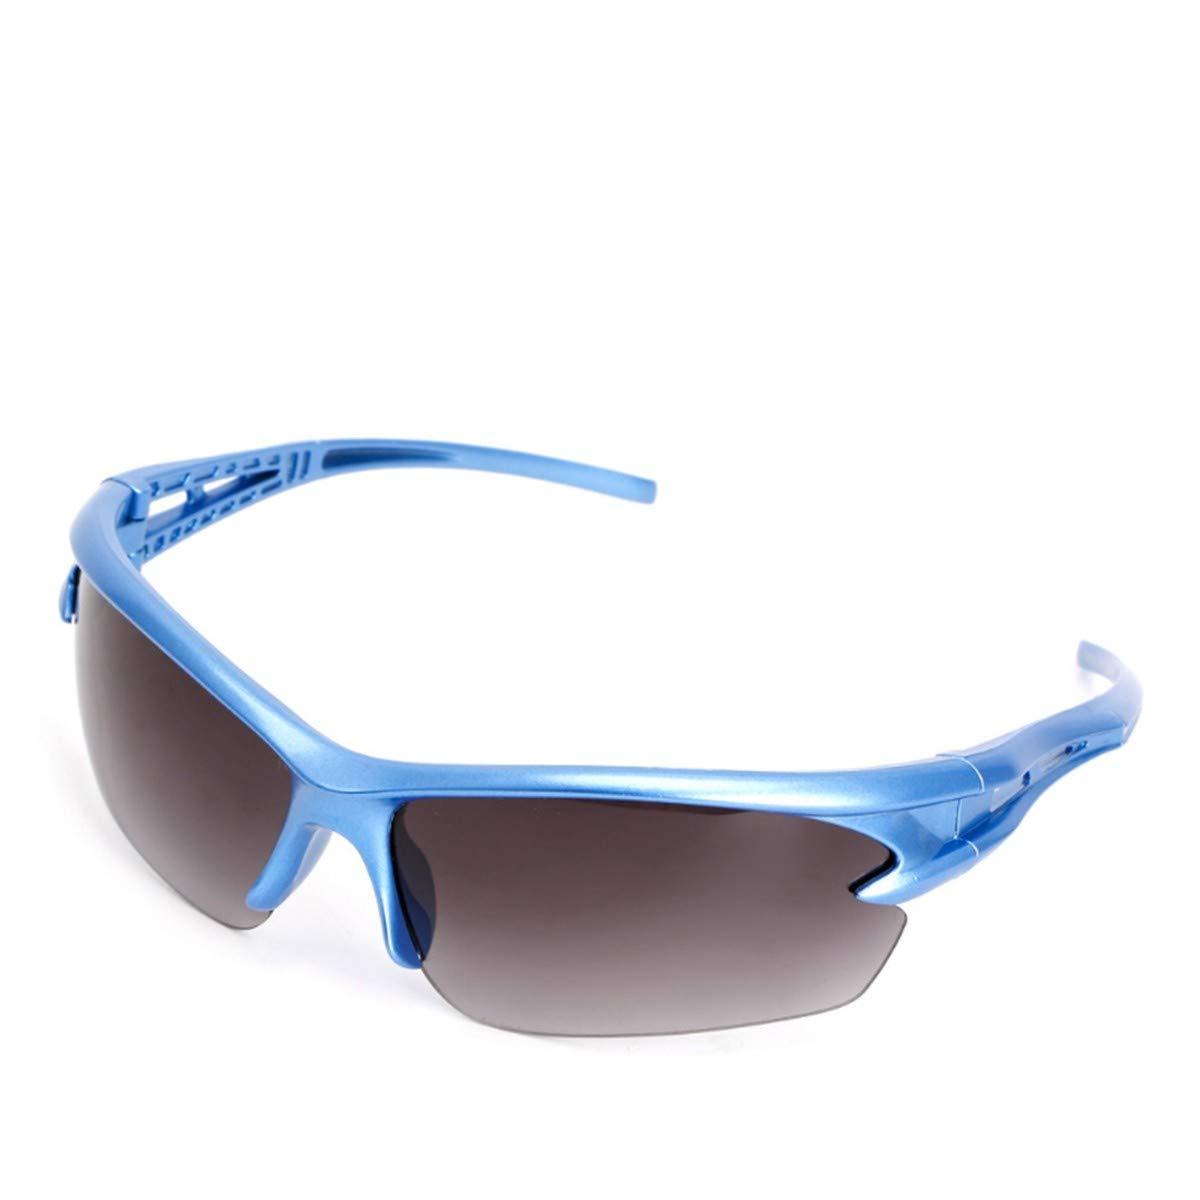 WENDAN EsquiandoNueva Moto montada Corriendo Gafas de Esqui